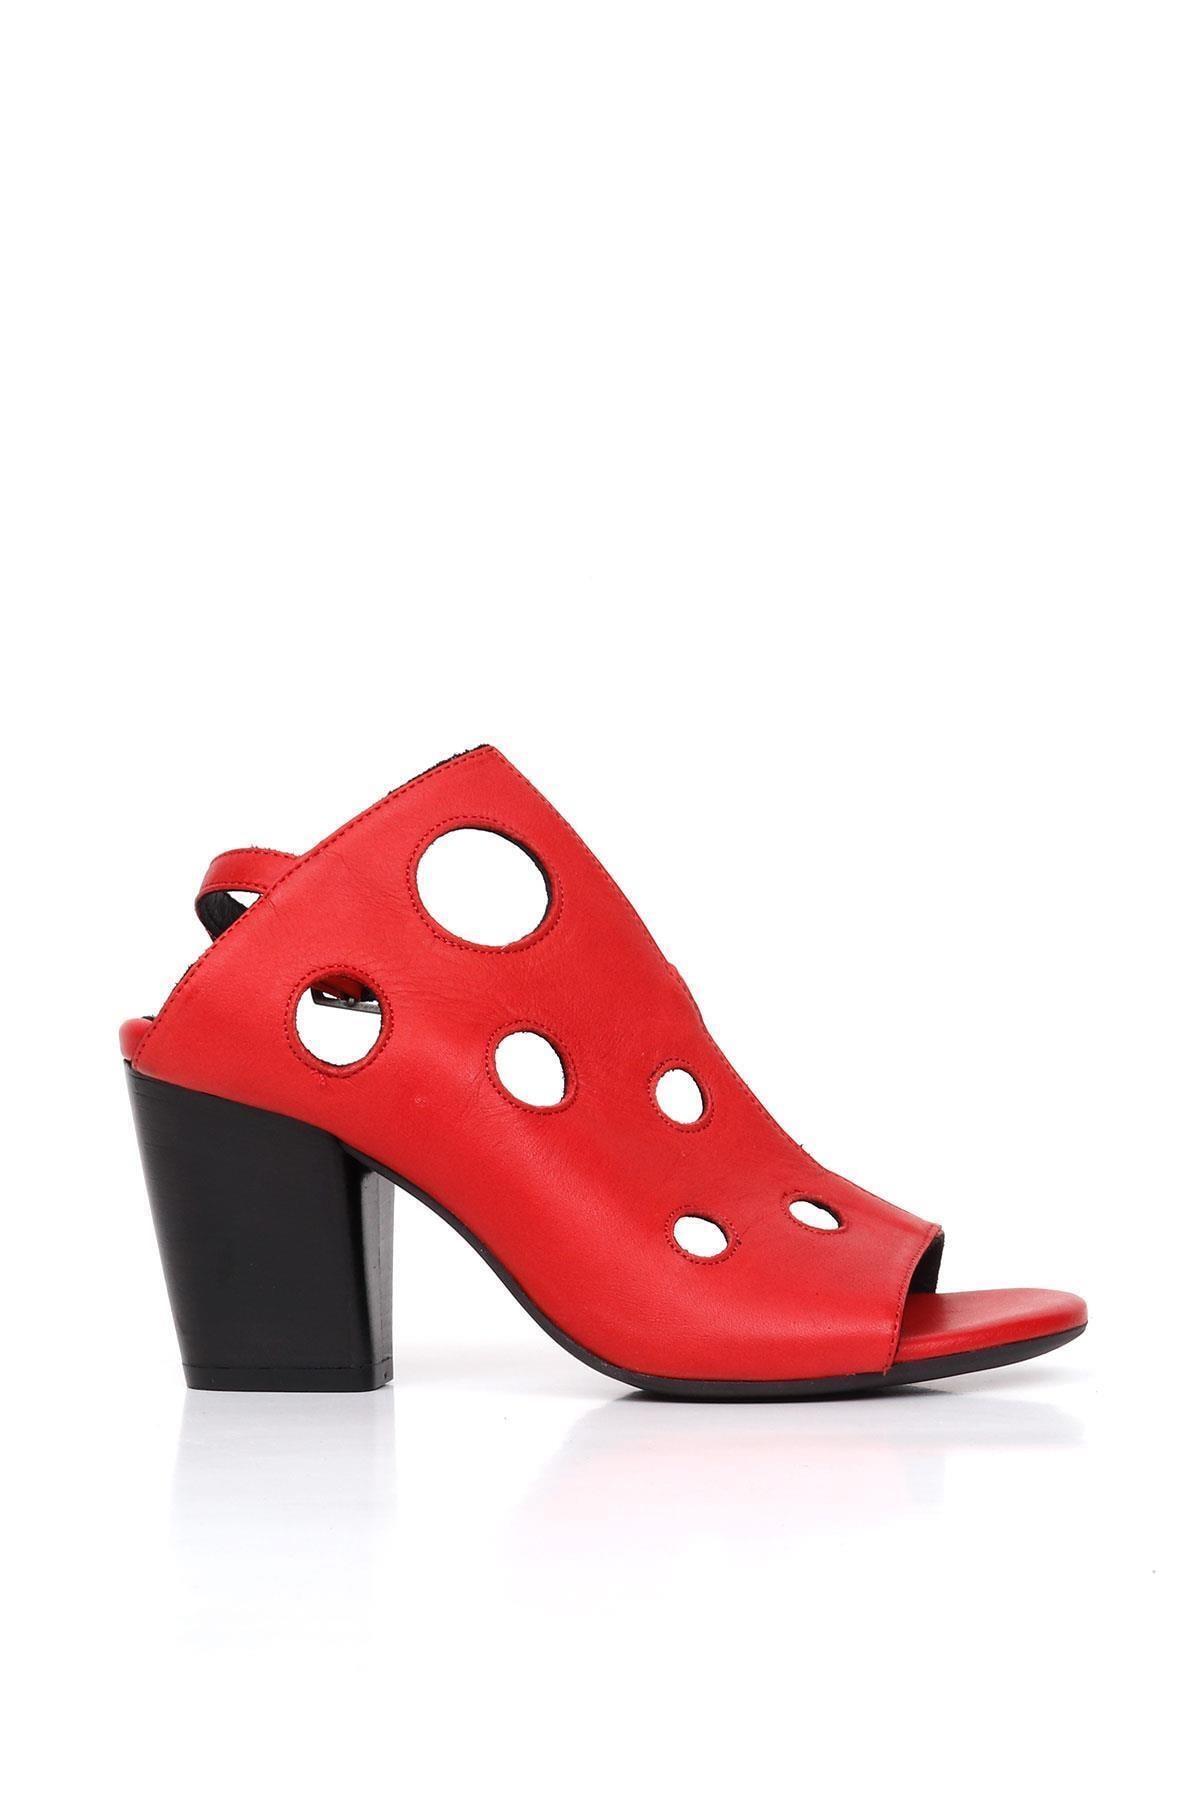 BUENO Shoes Desenli Hakiki Deri Kadın Topuklu Sandalet 9l3704 1